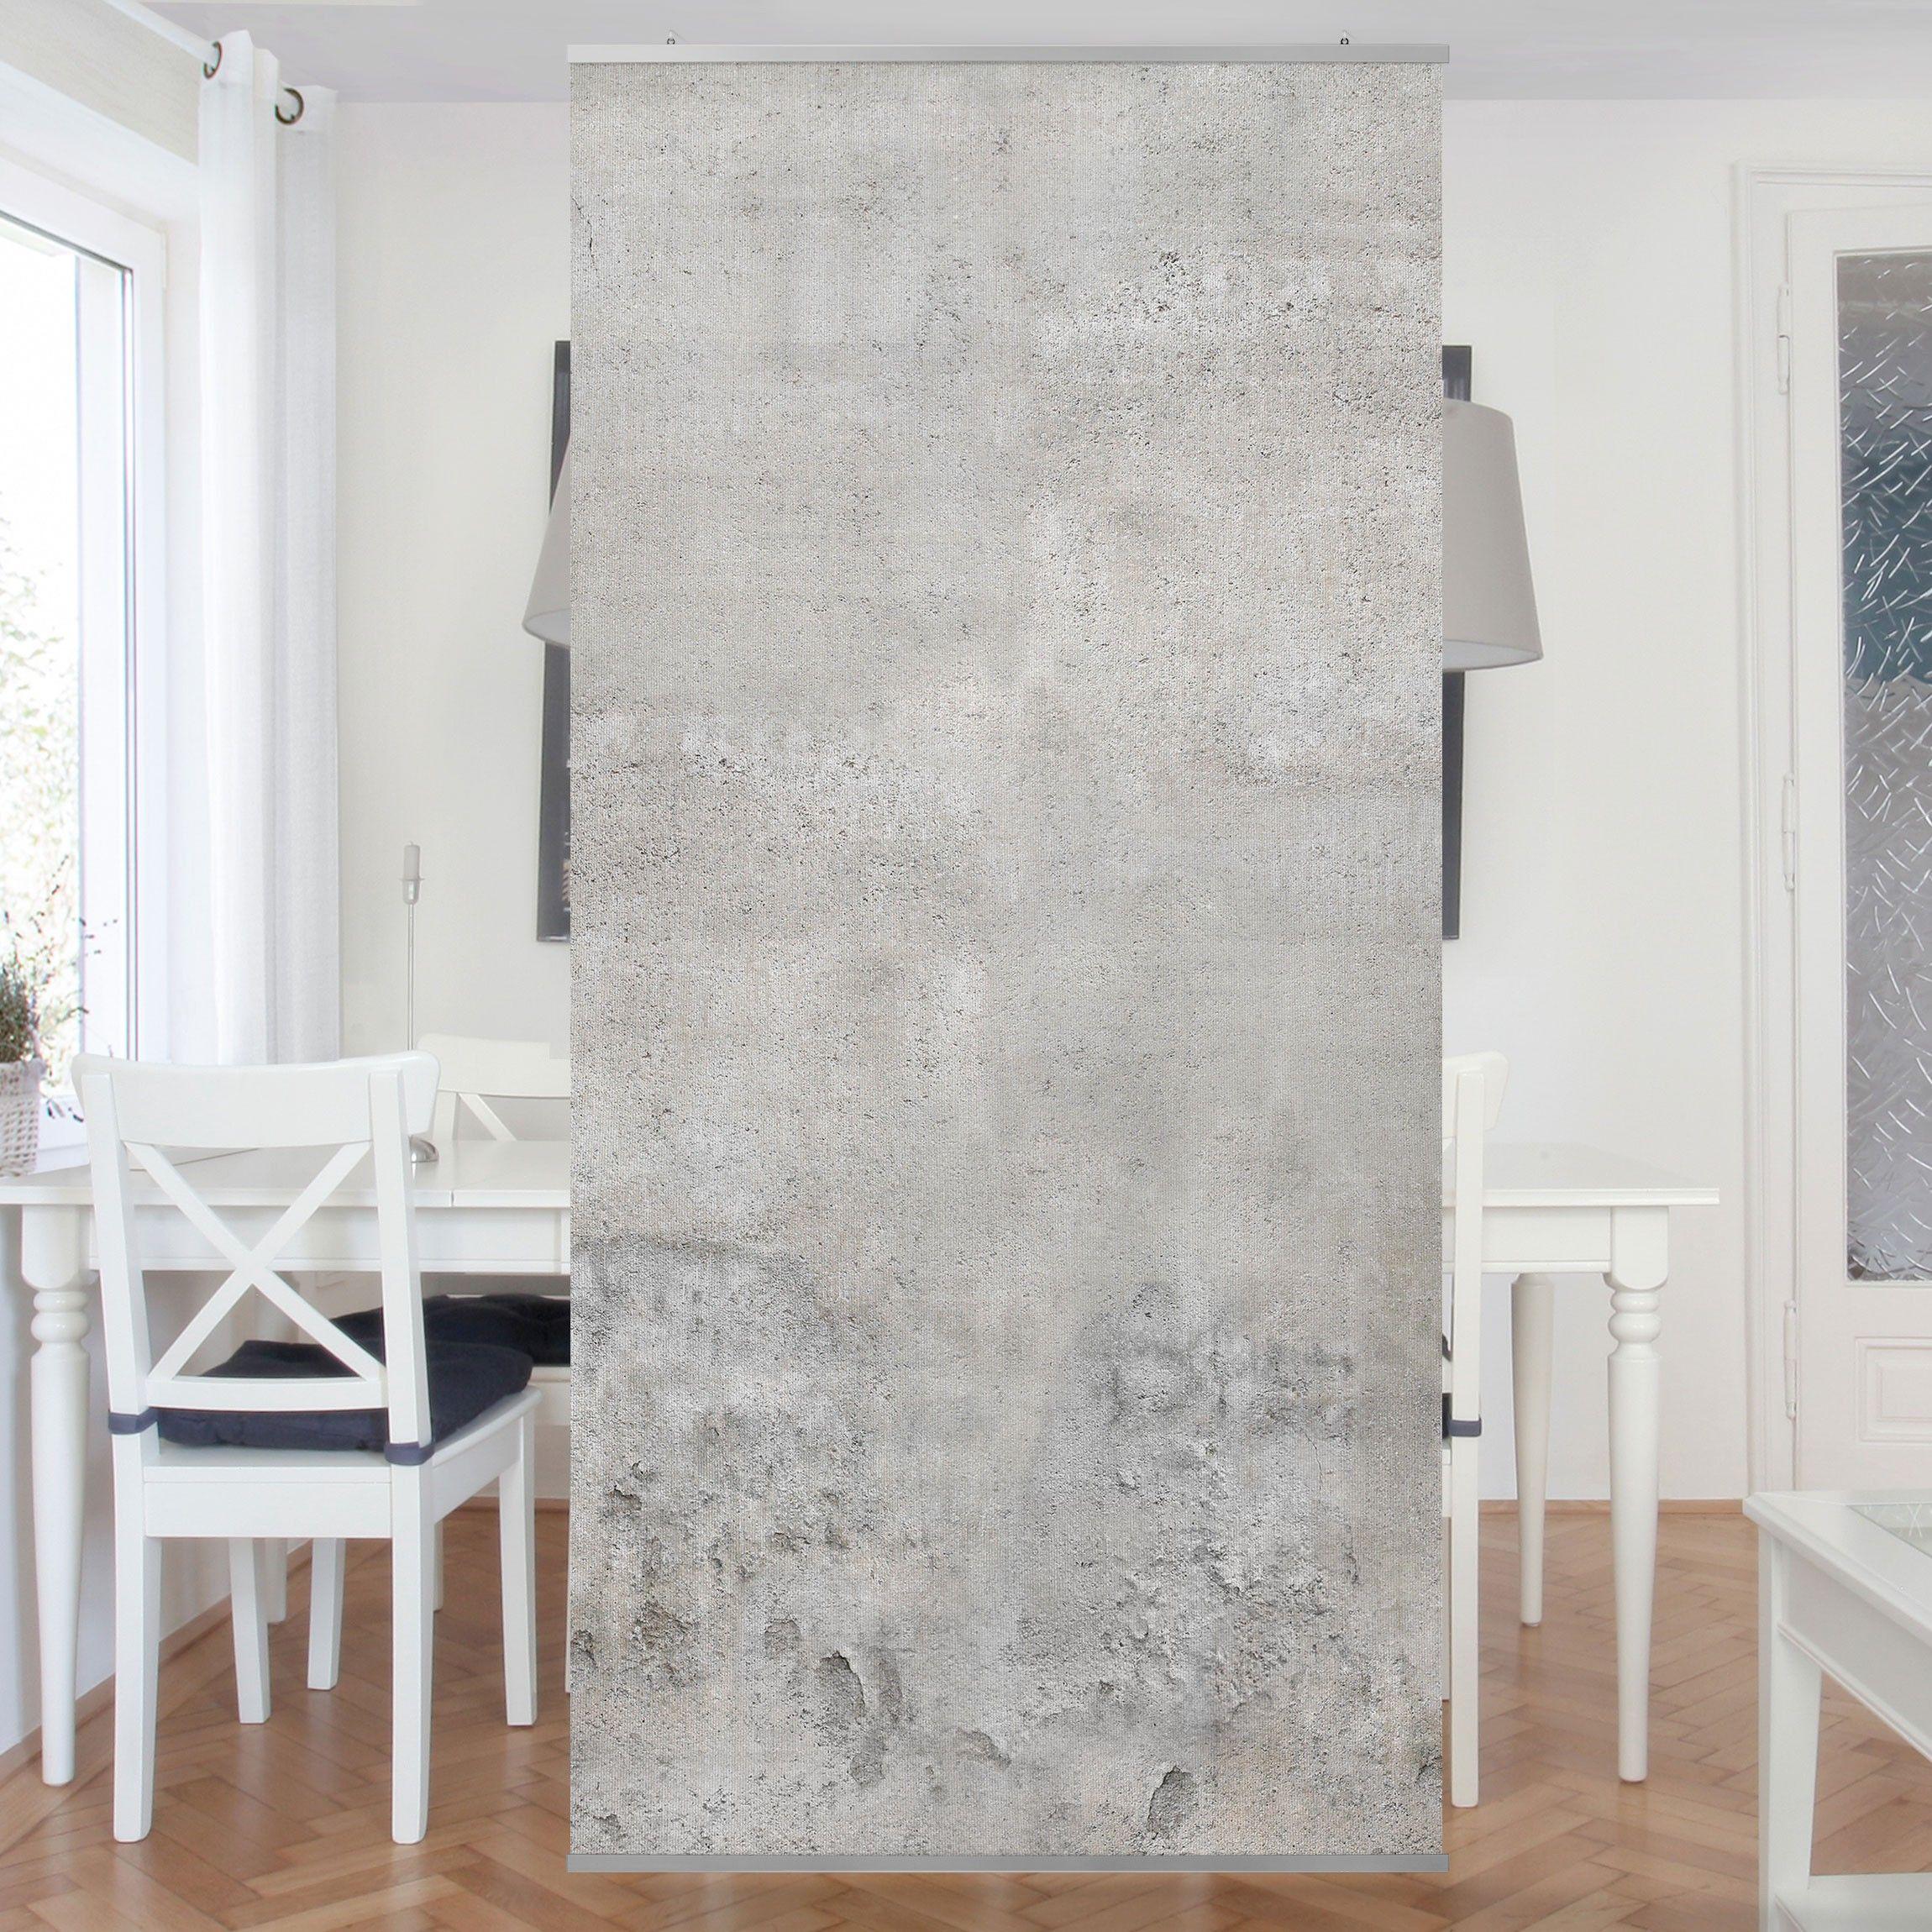 Raumteiler   shabby betonoptik 250x120cm